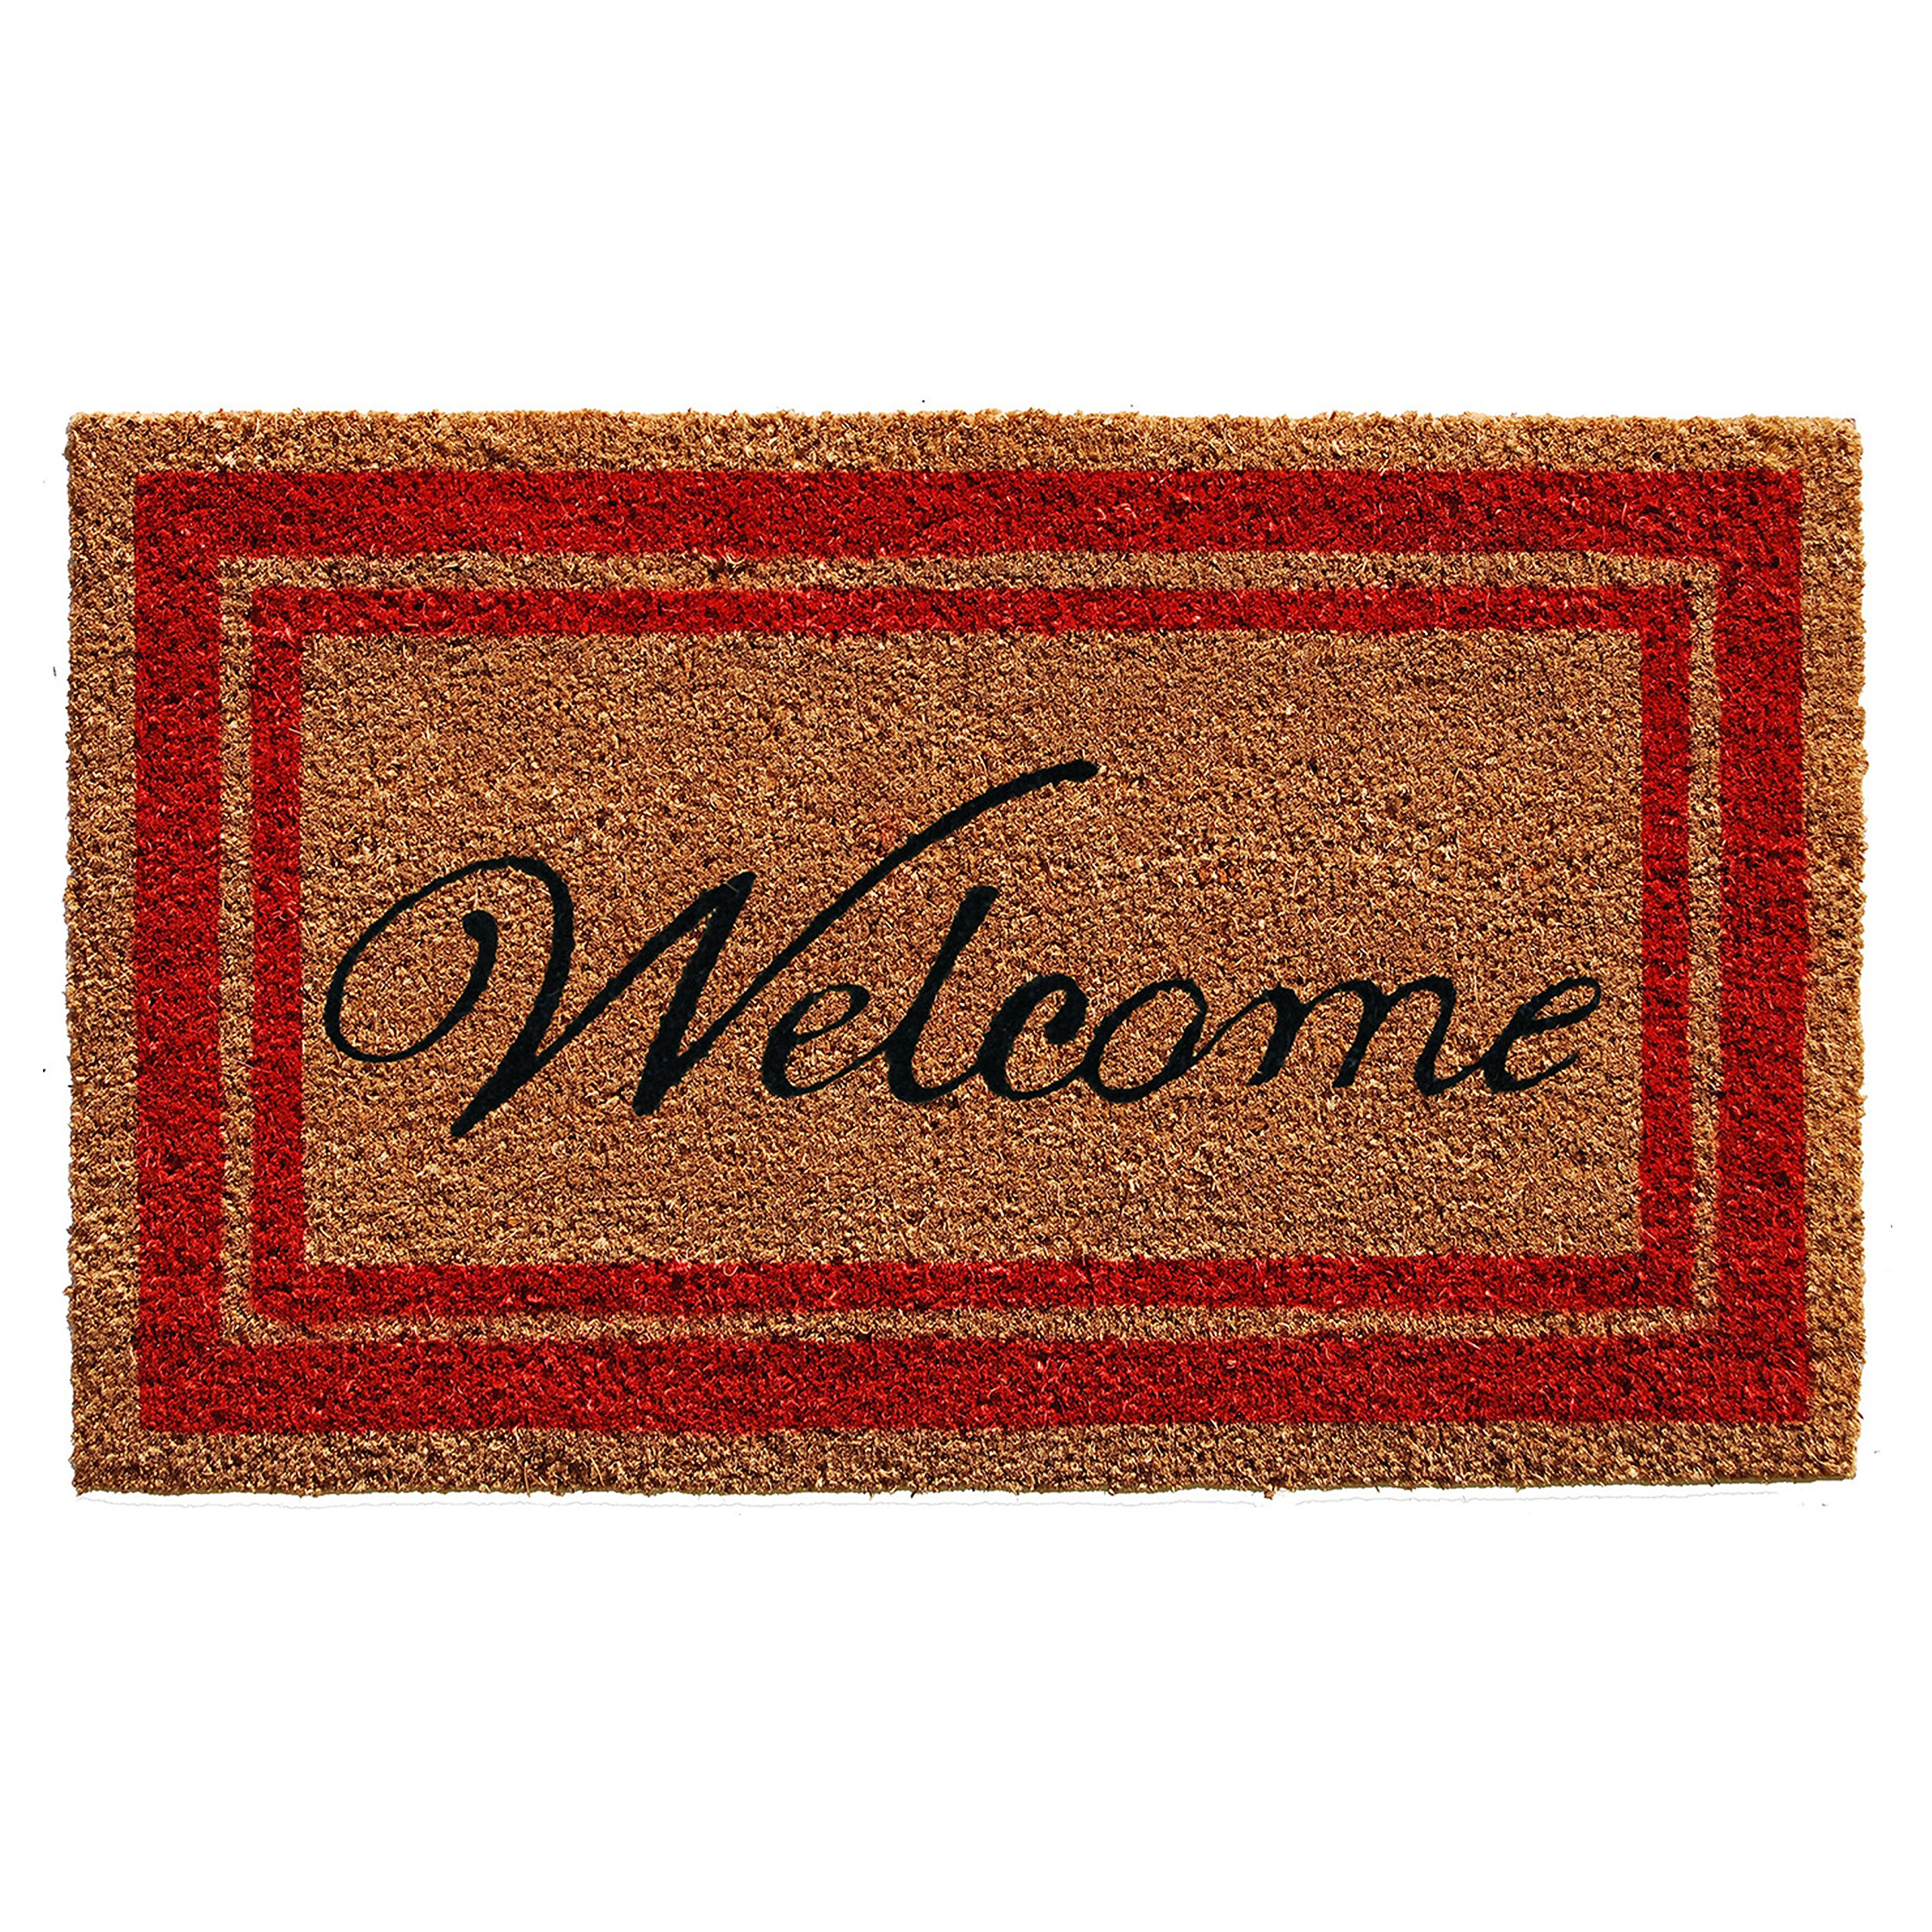 Home & More Border Welcome Doormat 18'' x 30'' (Red)